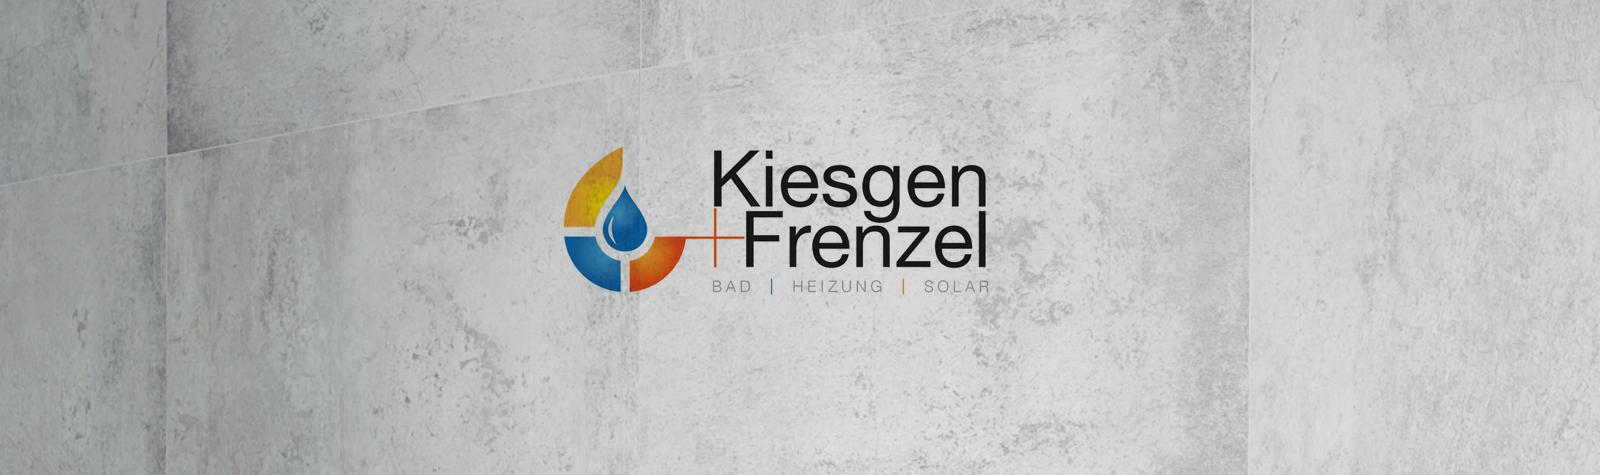 Kiesgen + Frenzel / Heizung & Sanitär – Neuer Flyer